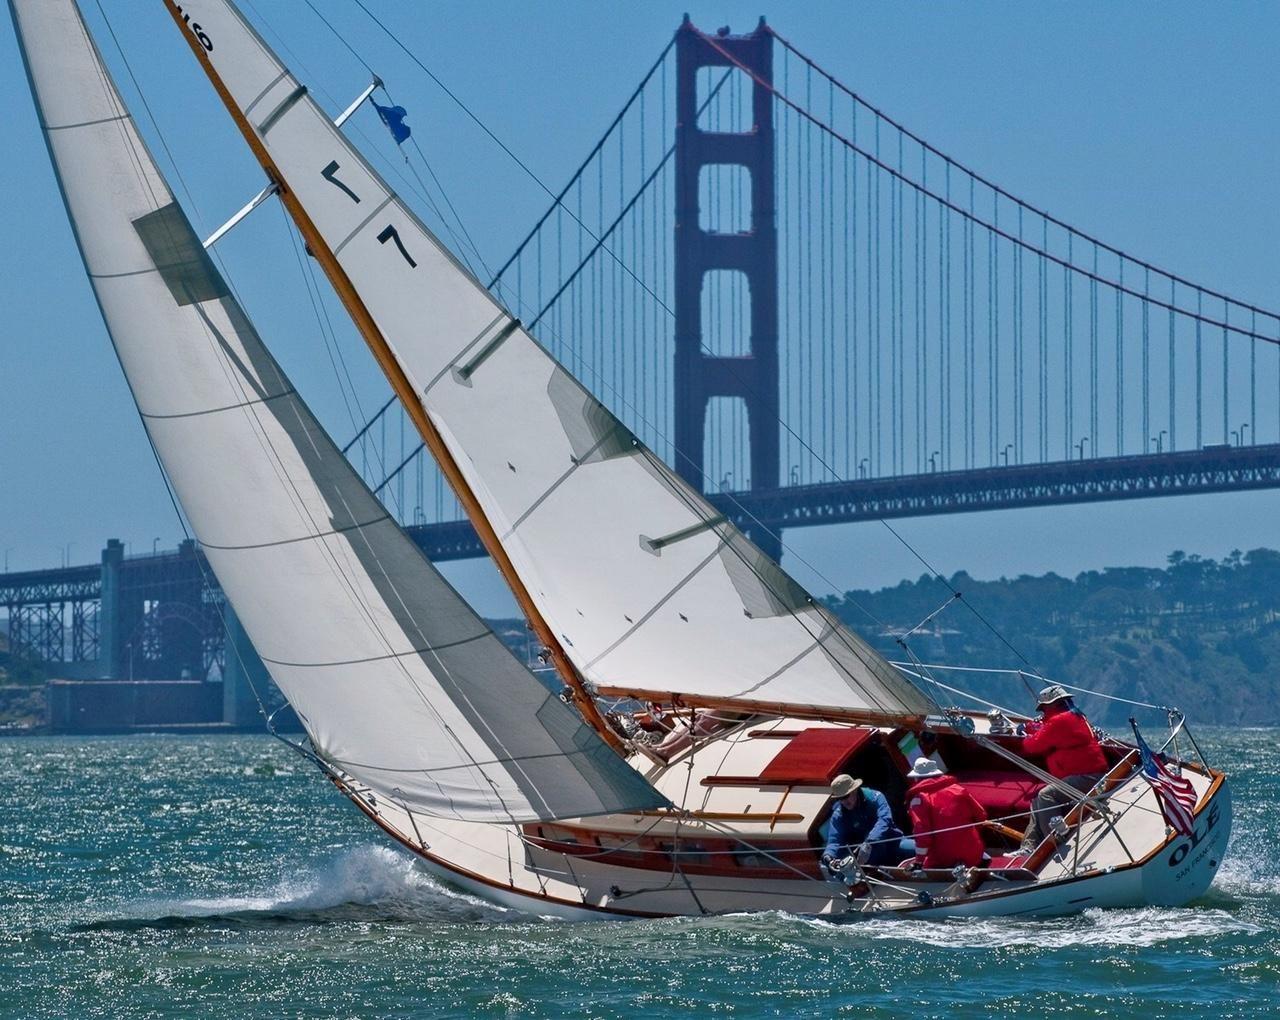 1960 Lapworth L 36 Sloop Sail Boat For Sale Www